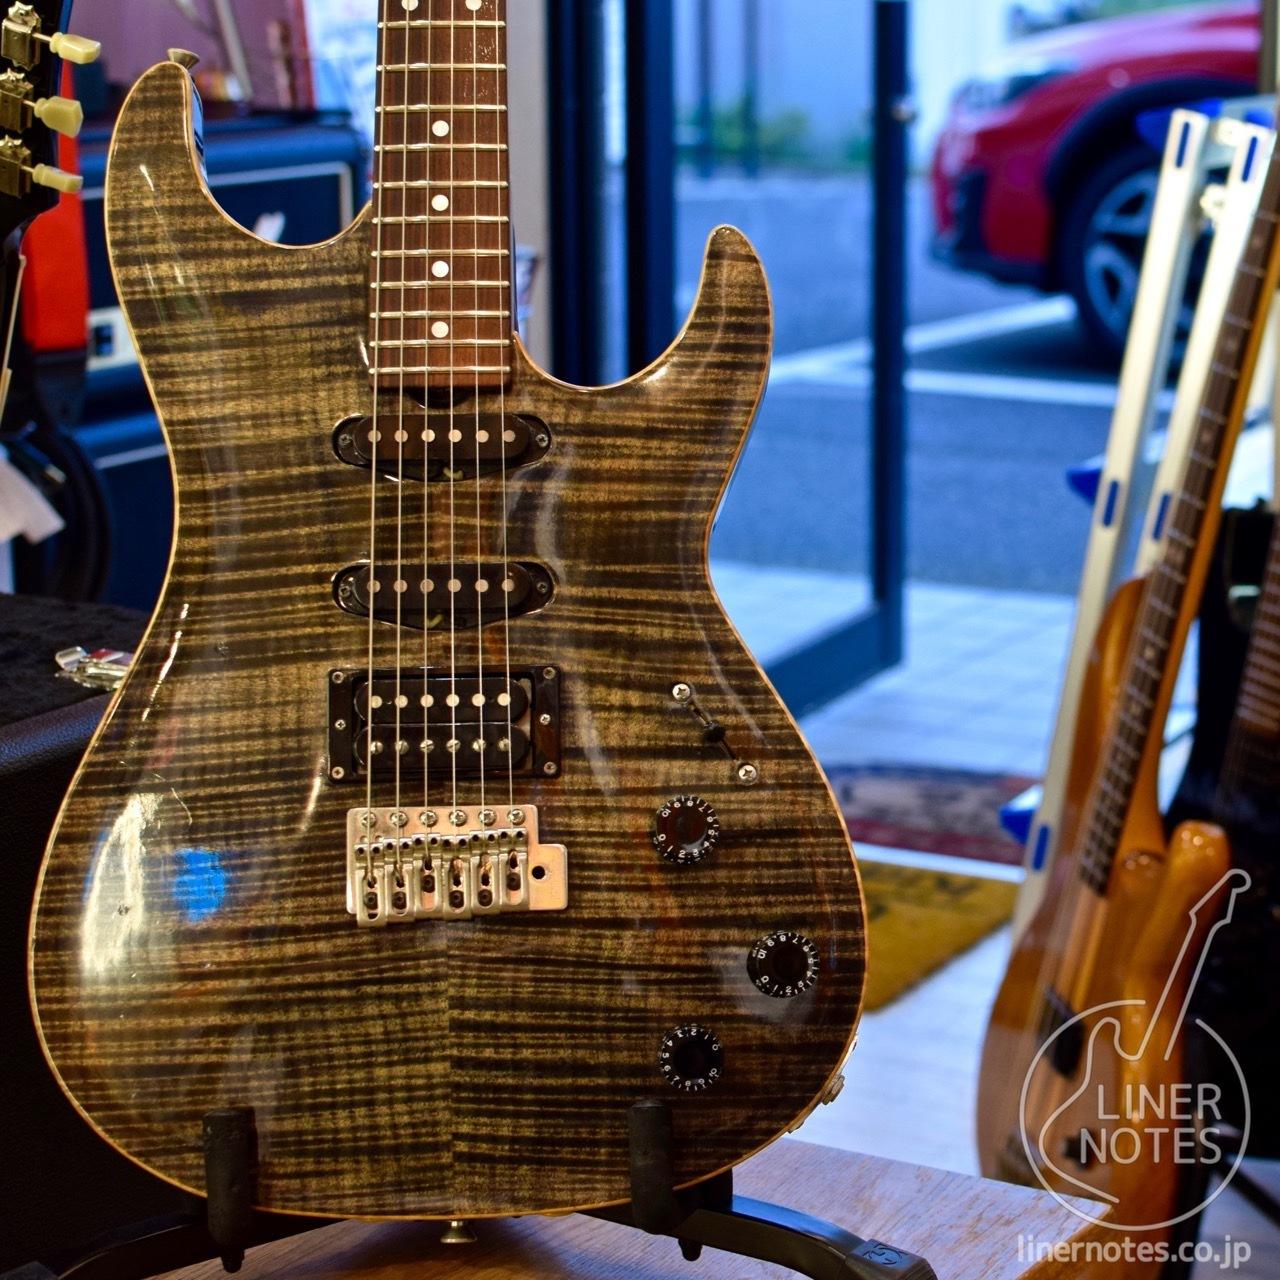 Don Grosh Custom Carve Top S (Trans Black) w / Brazilian Rosewood FB